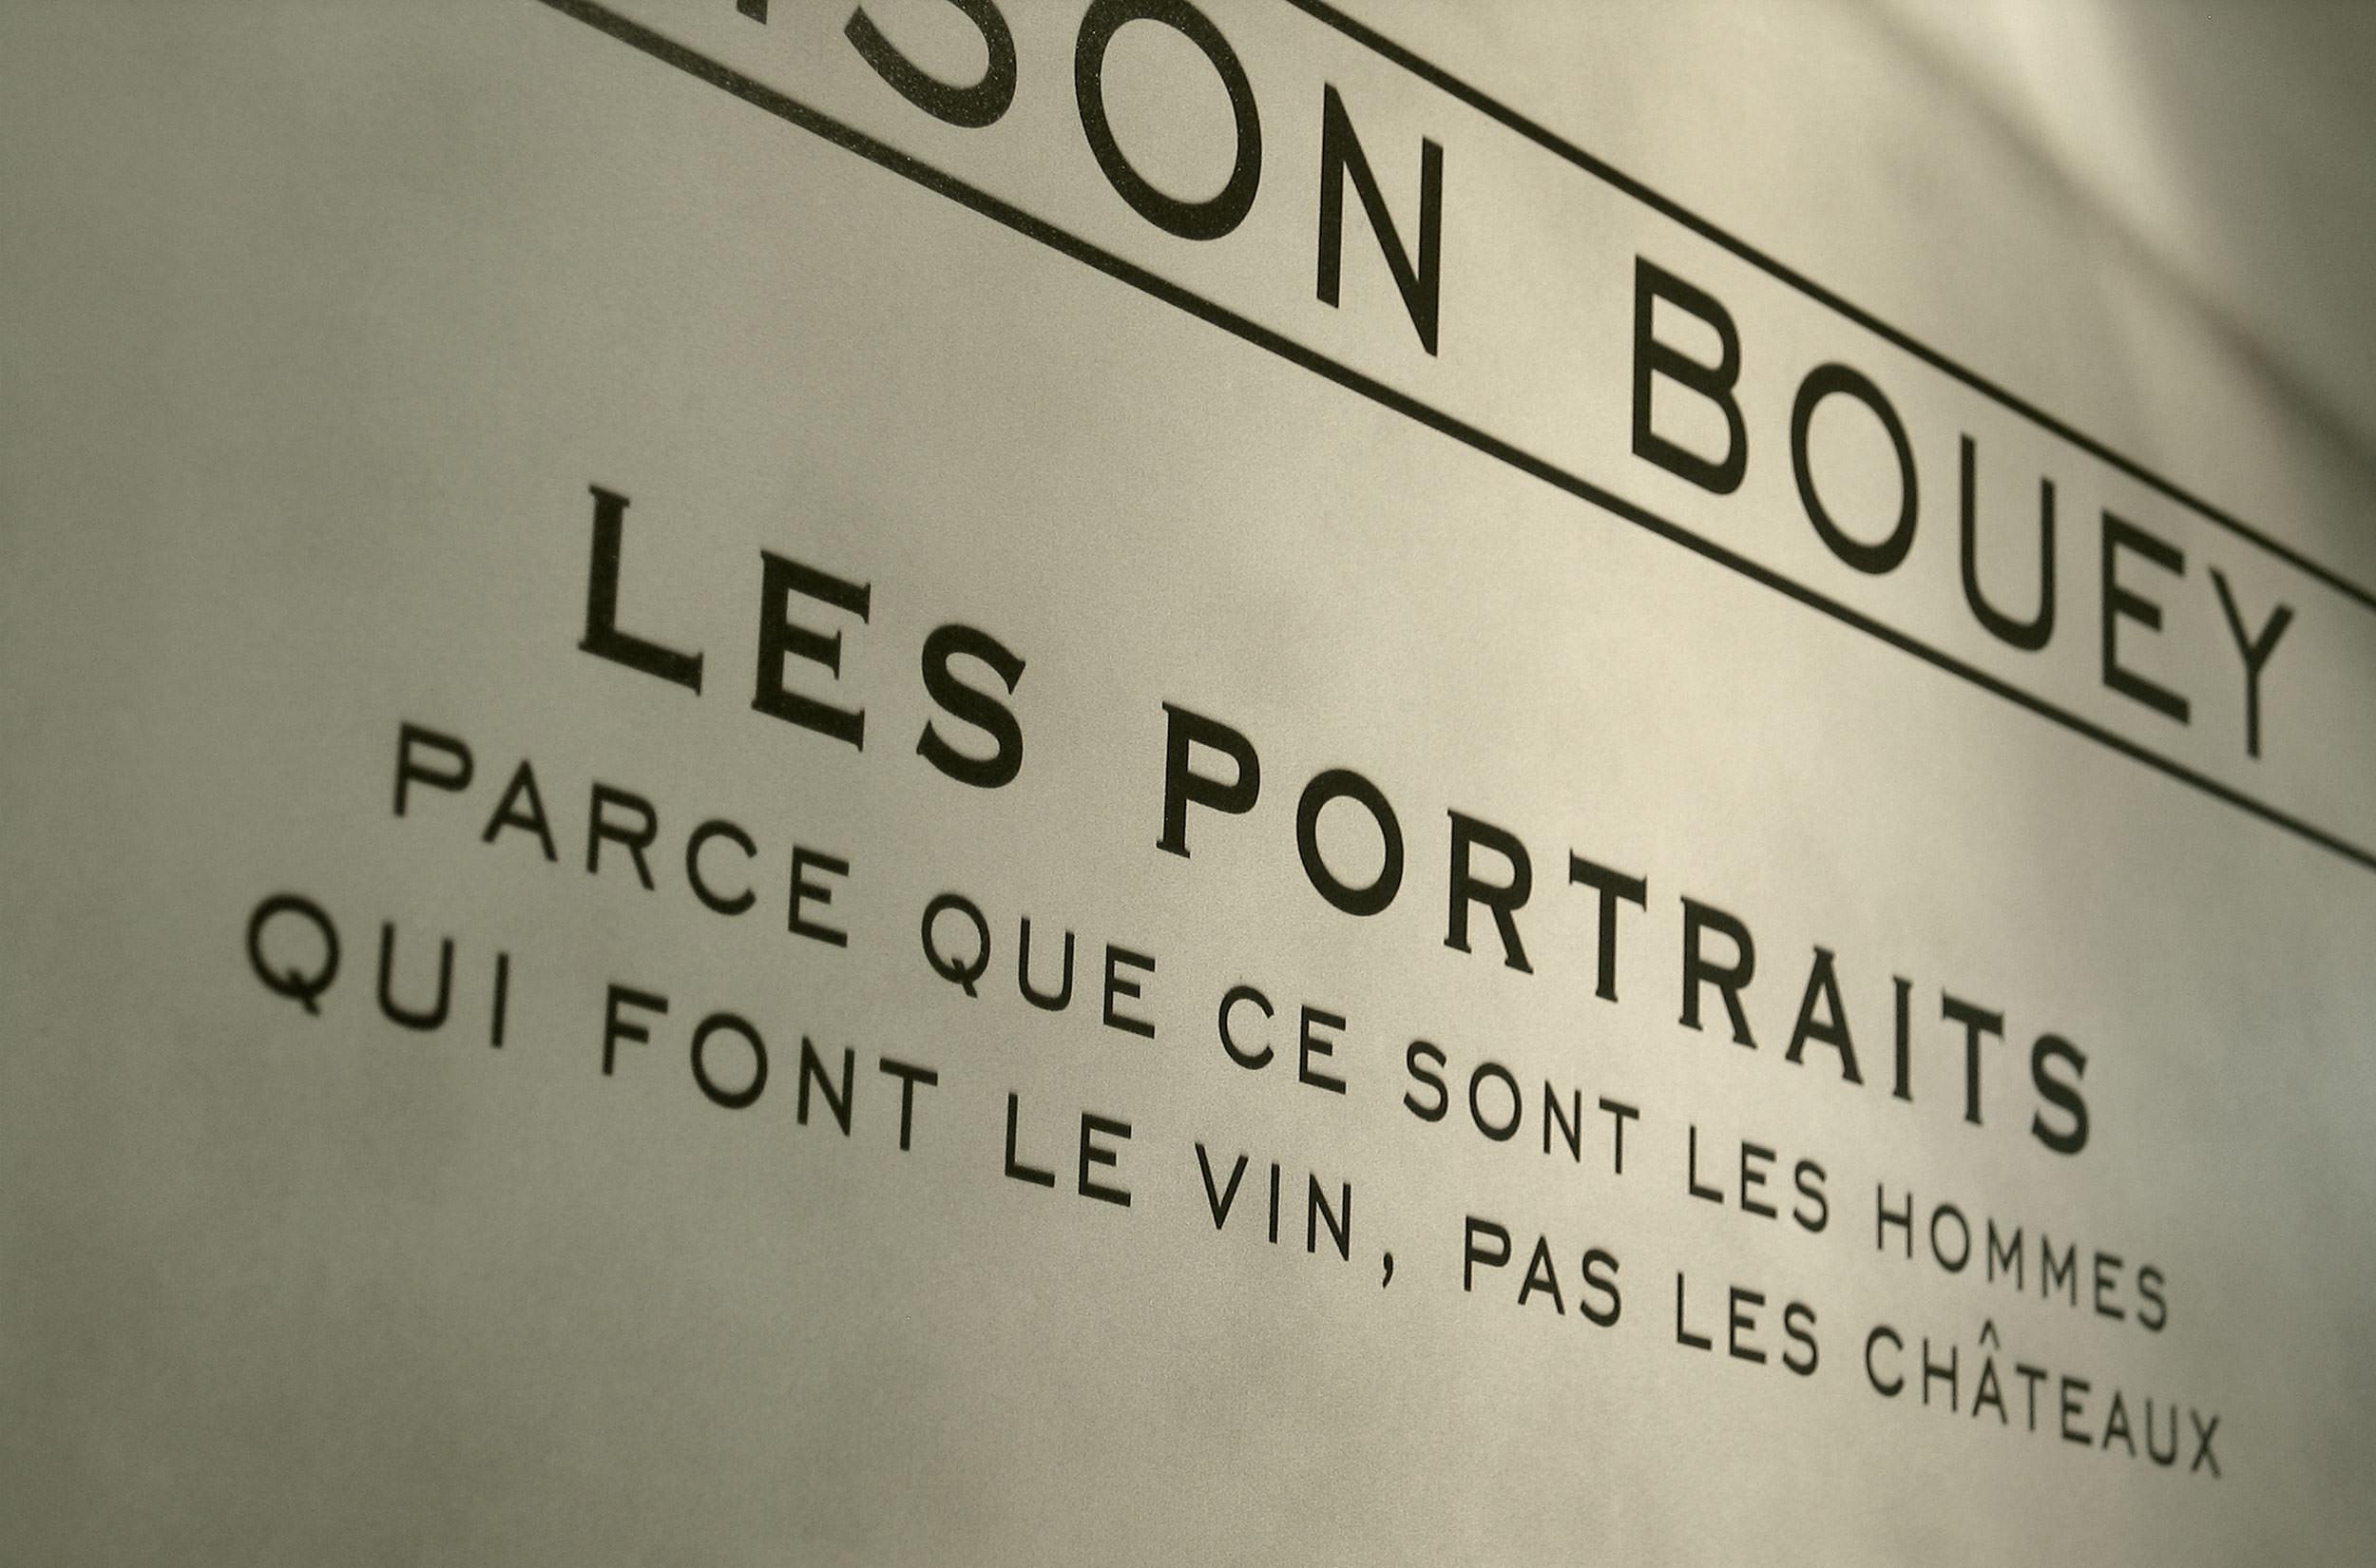 Maison Bouey - 2